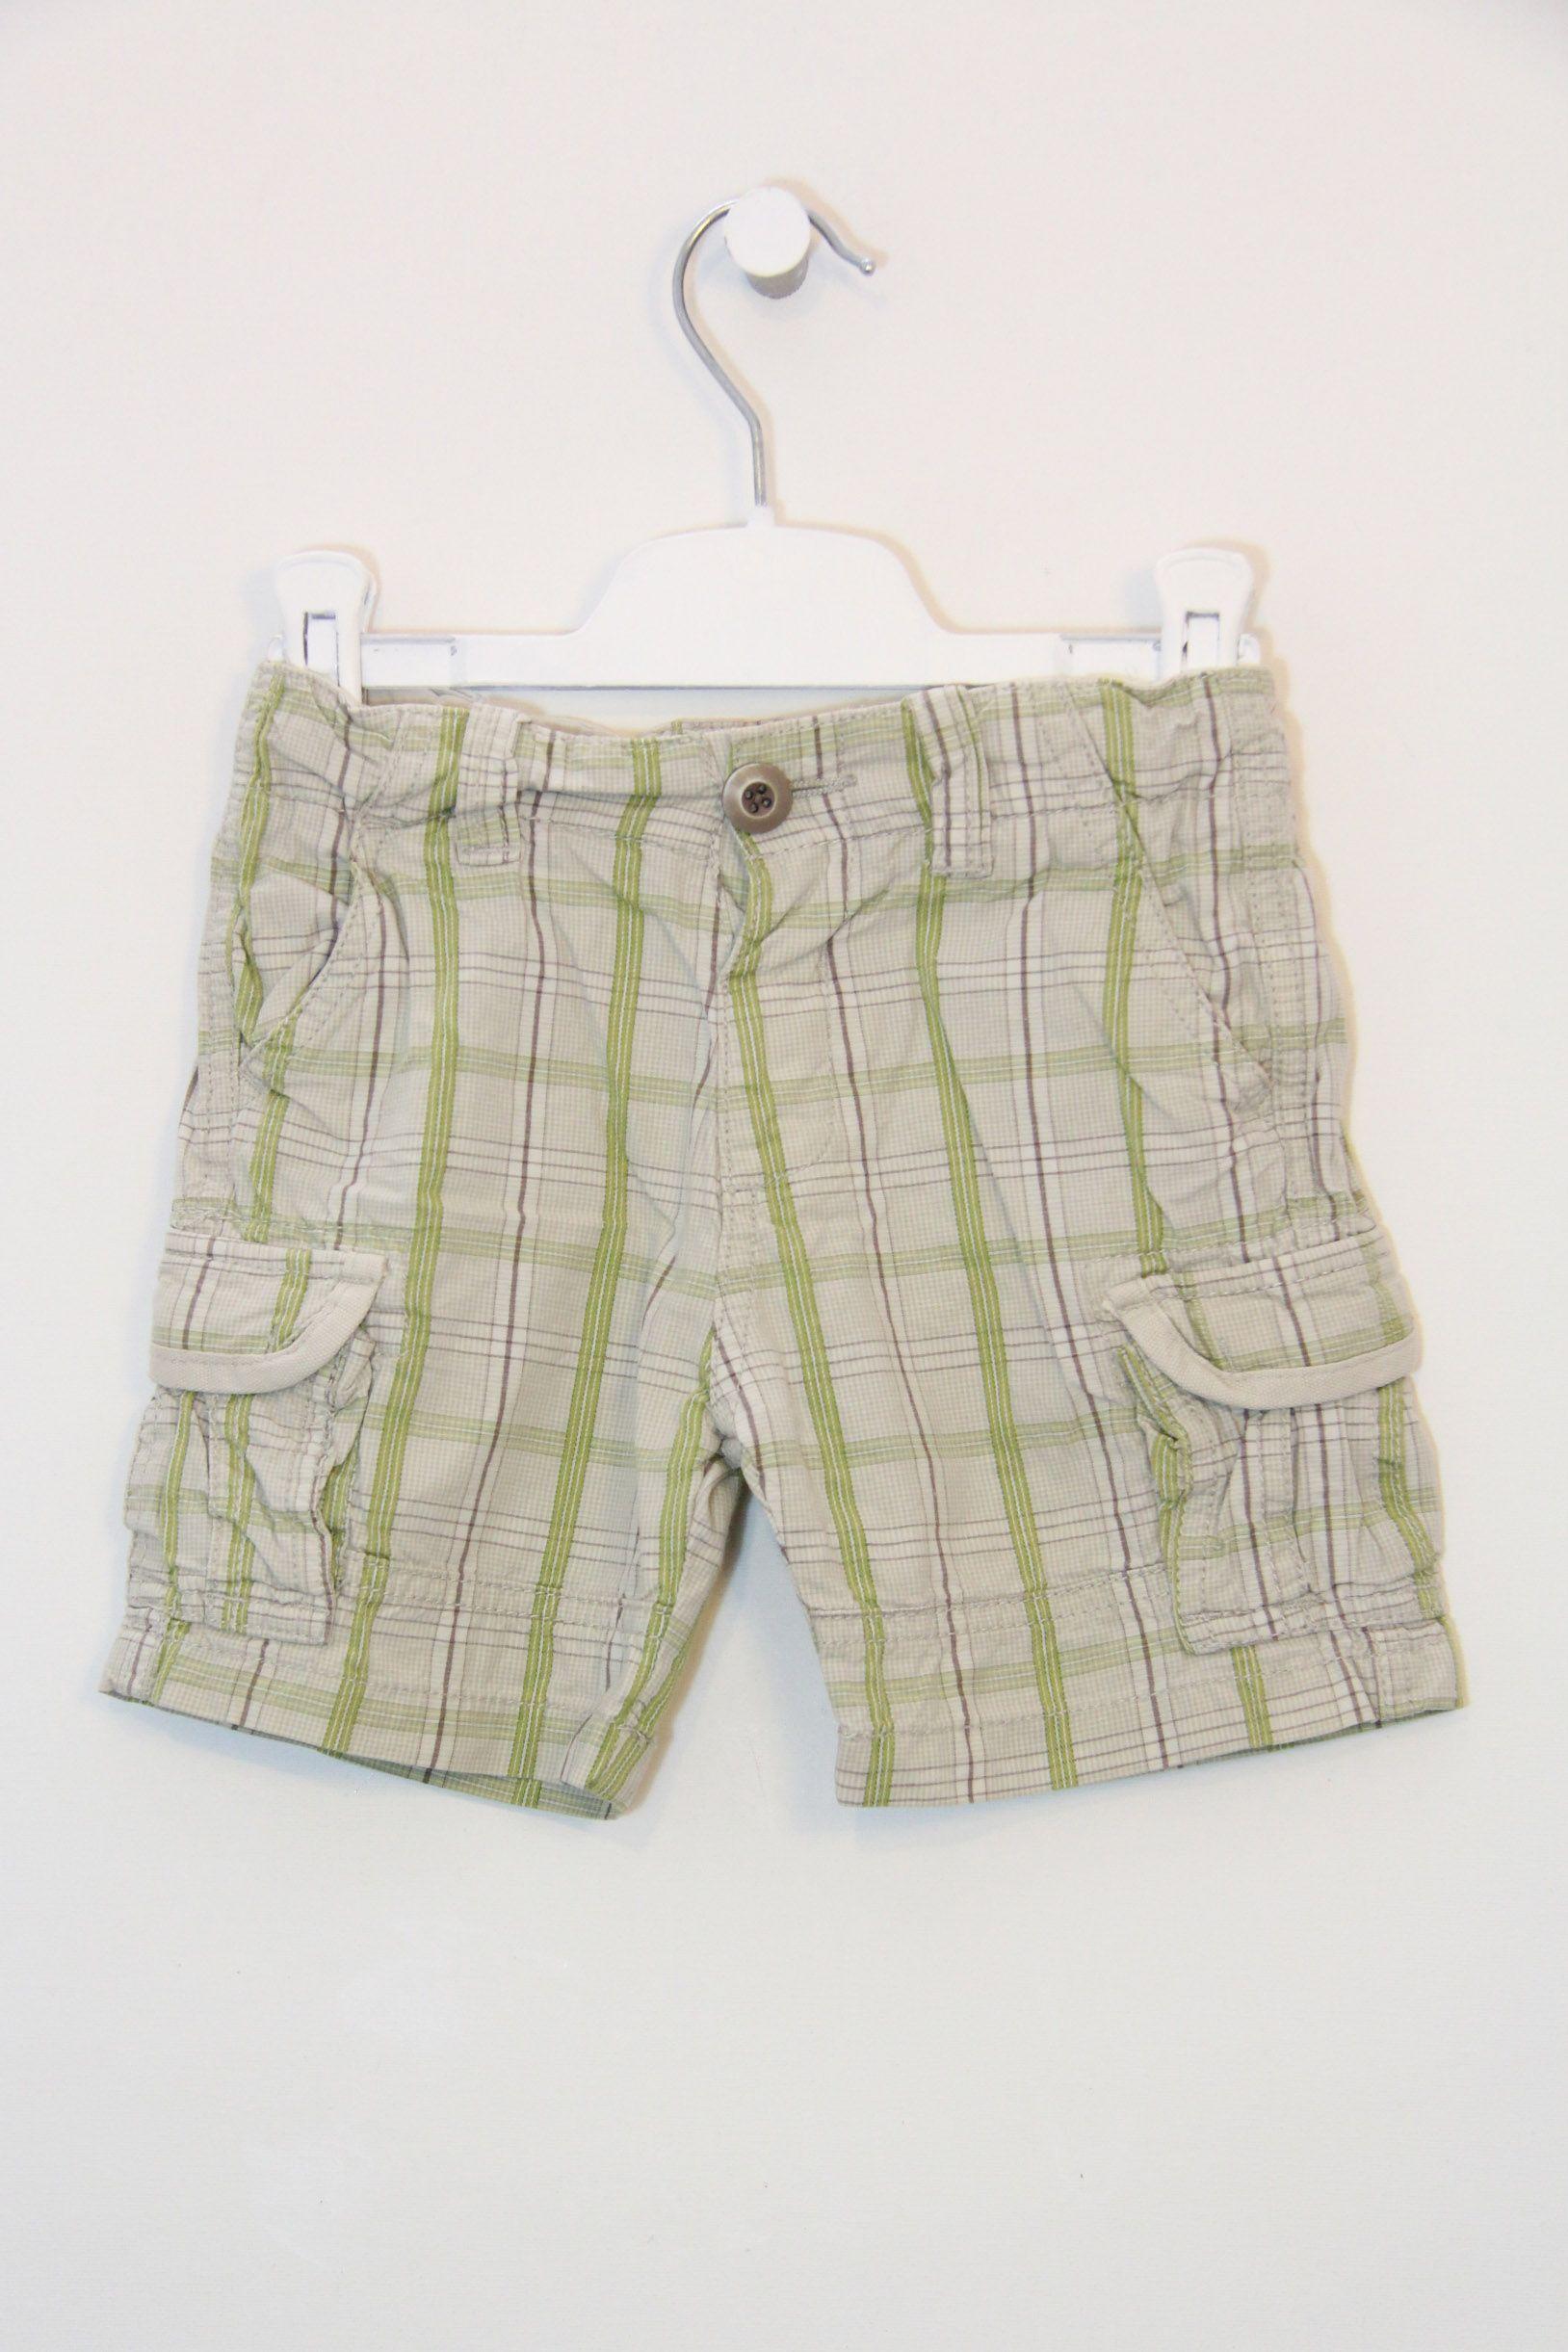 c030f5d01 Pantalón 12-18 meses 18 Meses